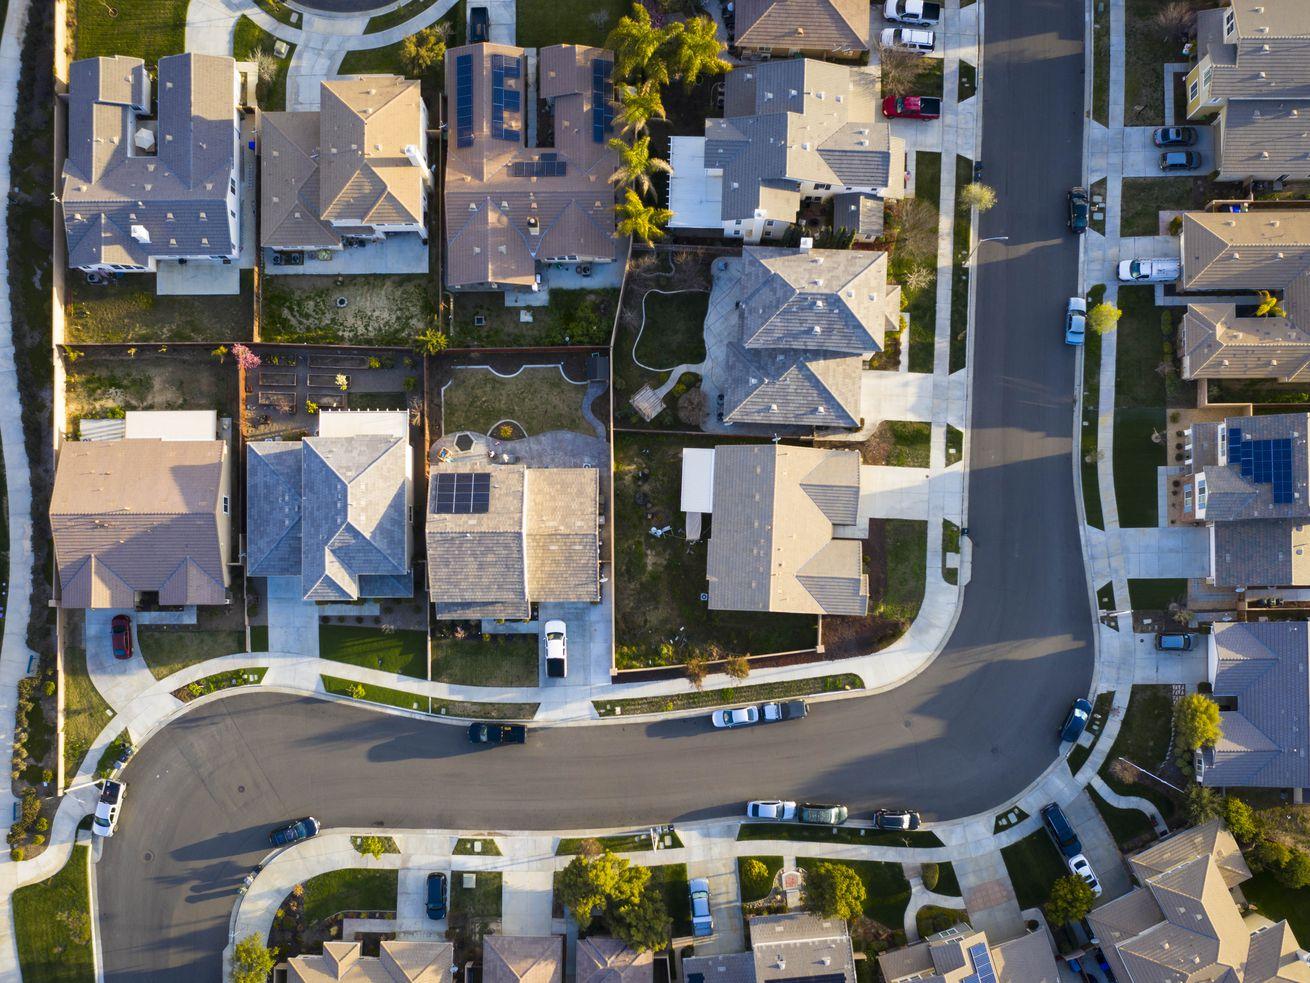 An overhead shot of a neighborhood in Los Angeles County.